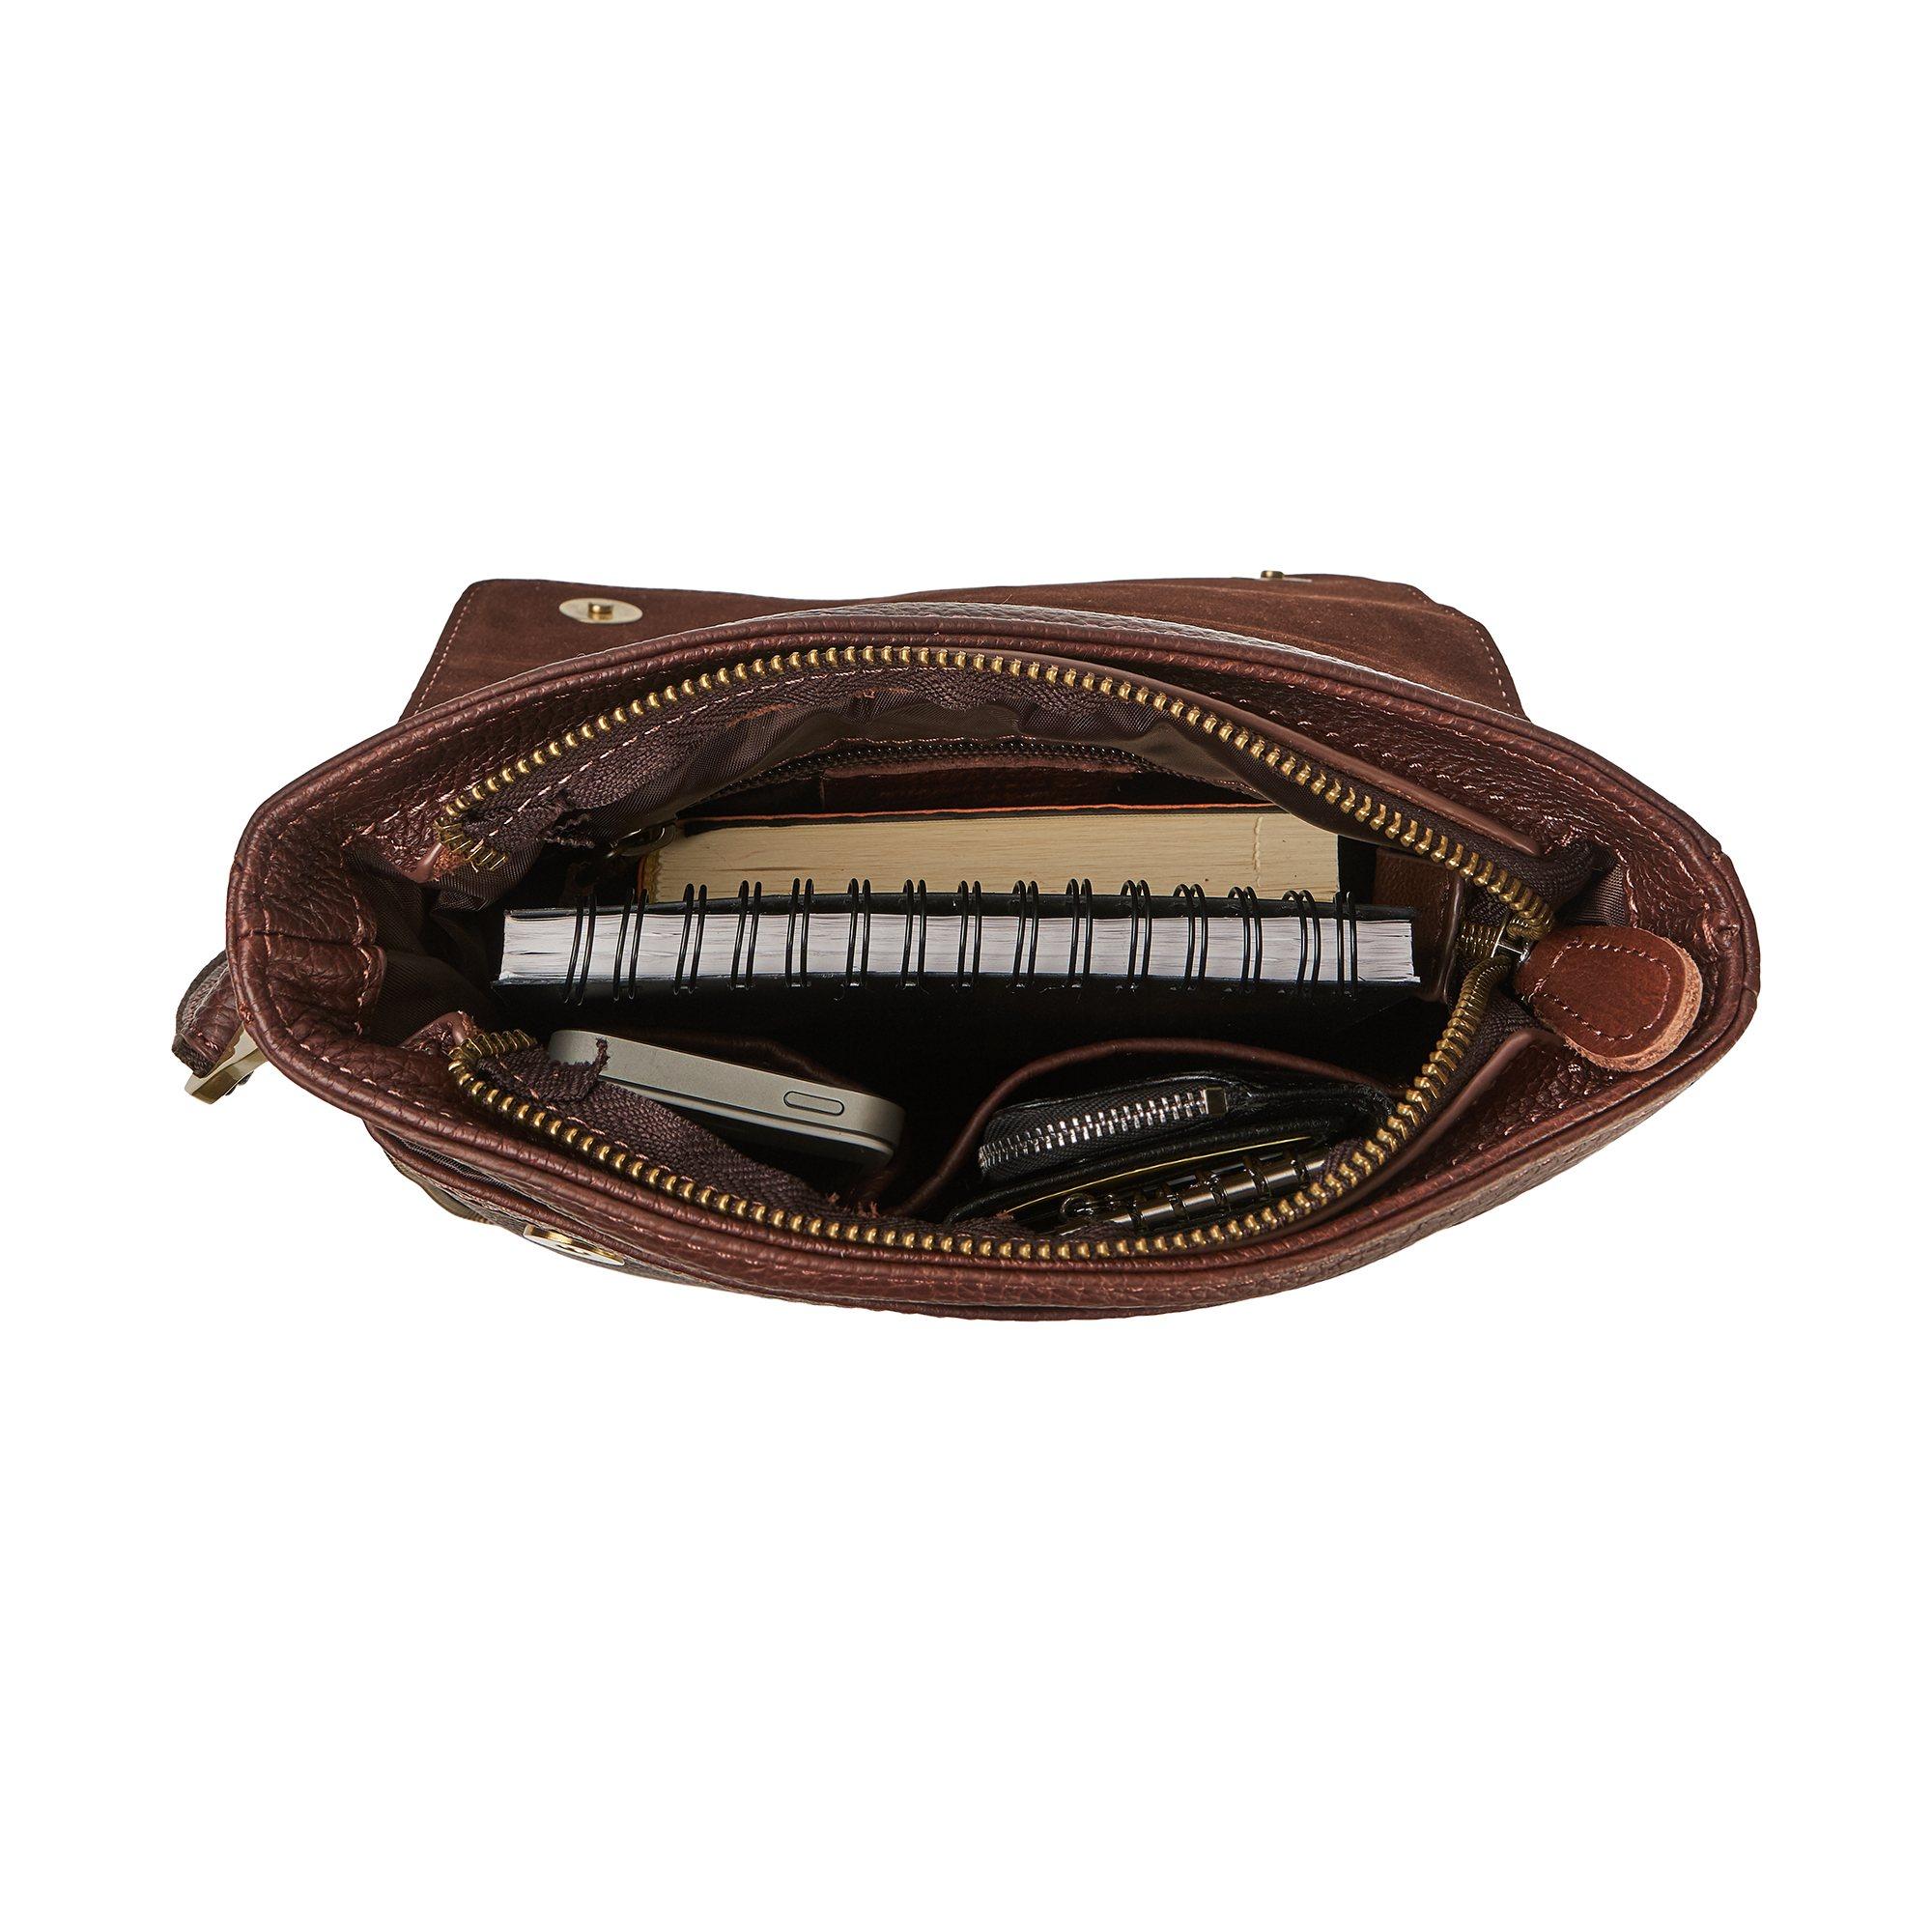 Фото 5 - Др.Коффер 2020-21-09 сумка через плечо